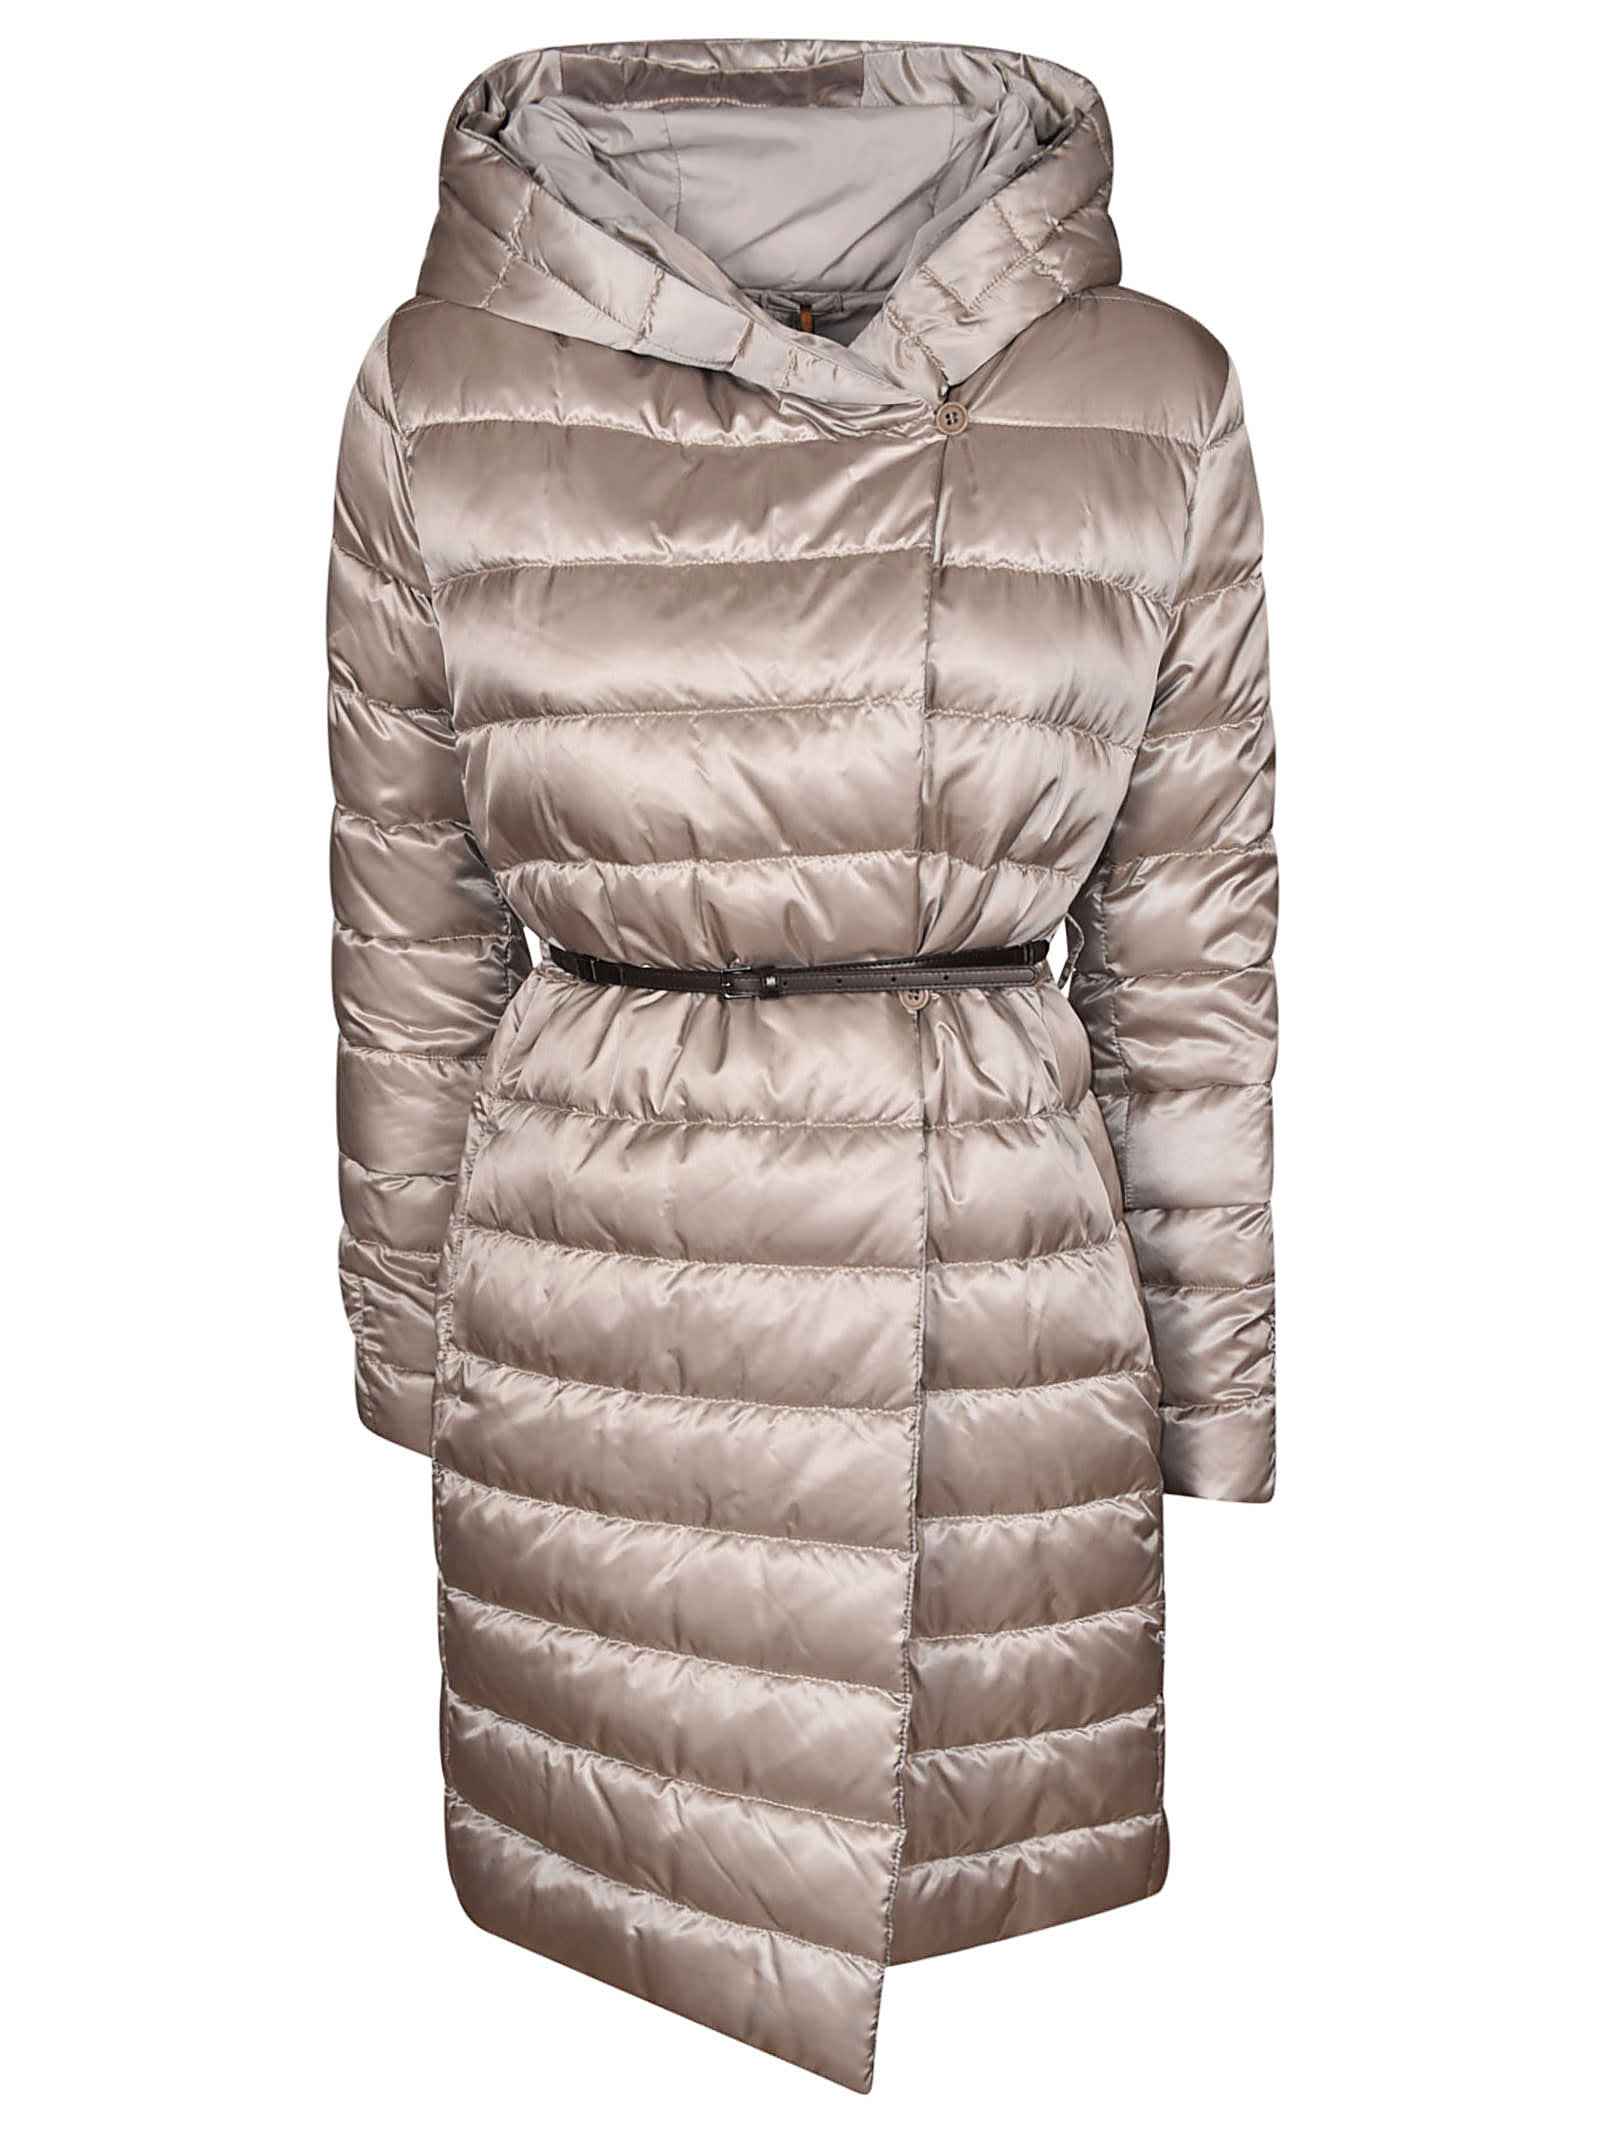 Max Mara Padded Hooded One-sided Coat